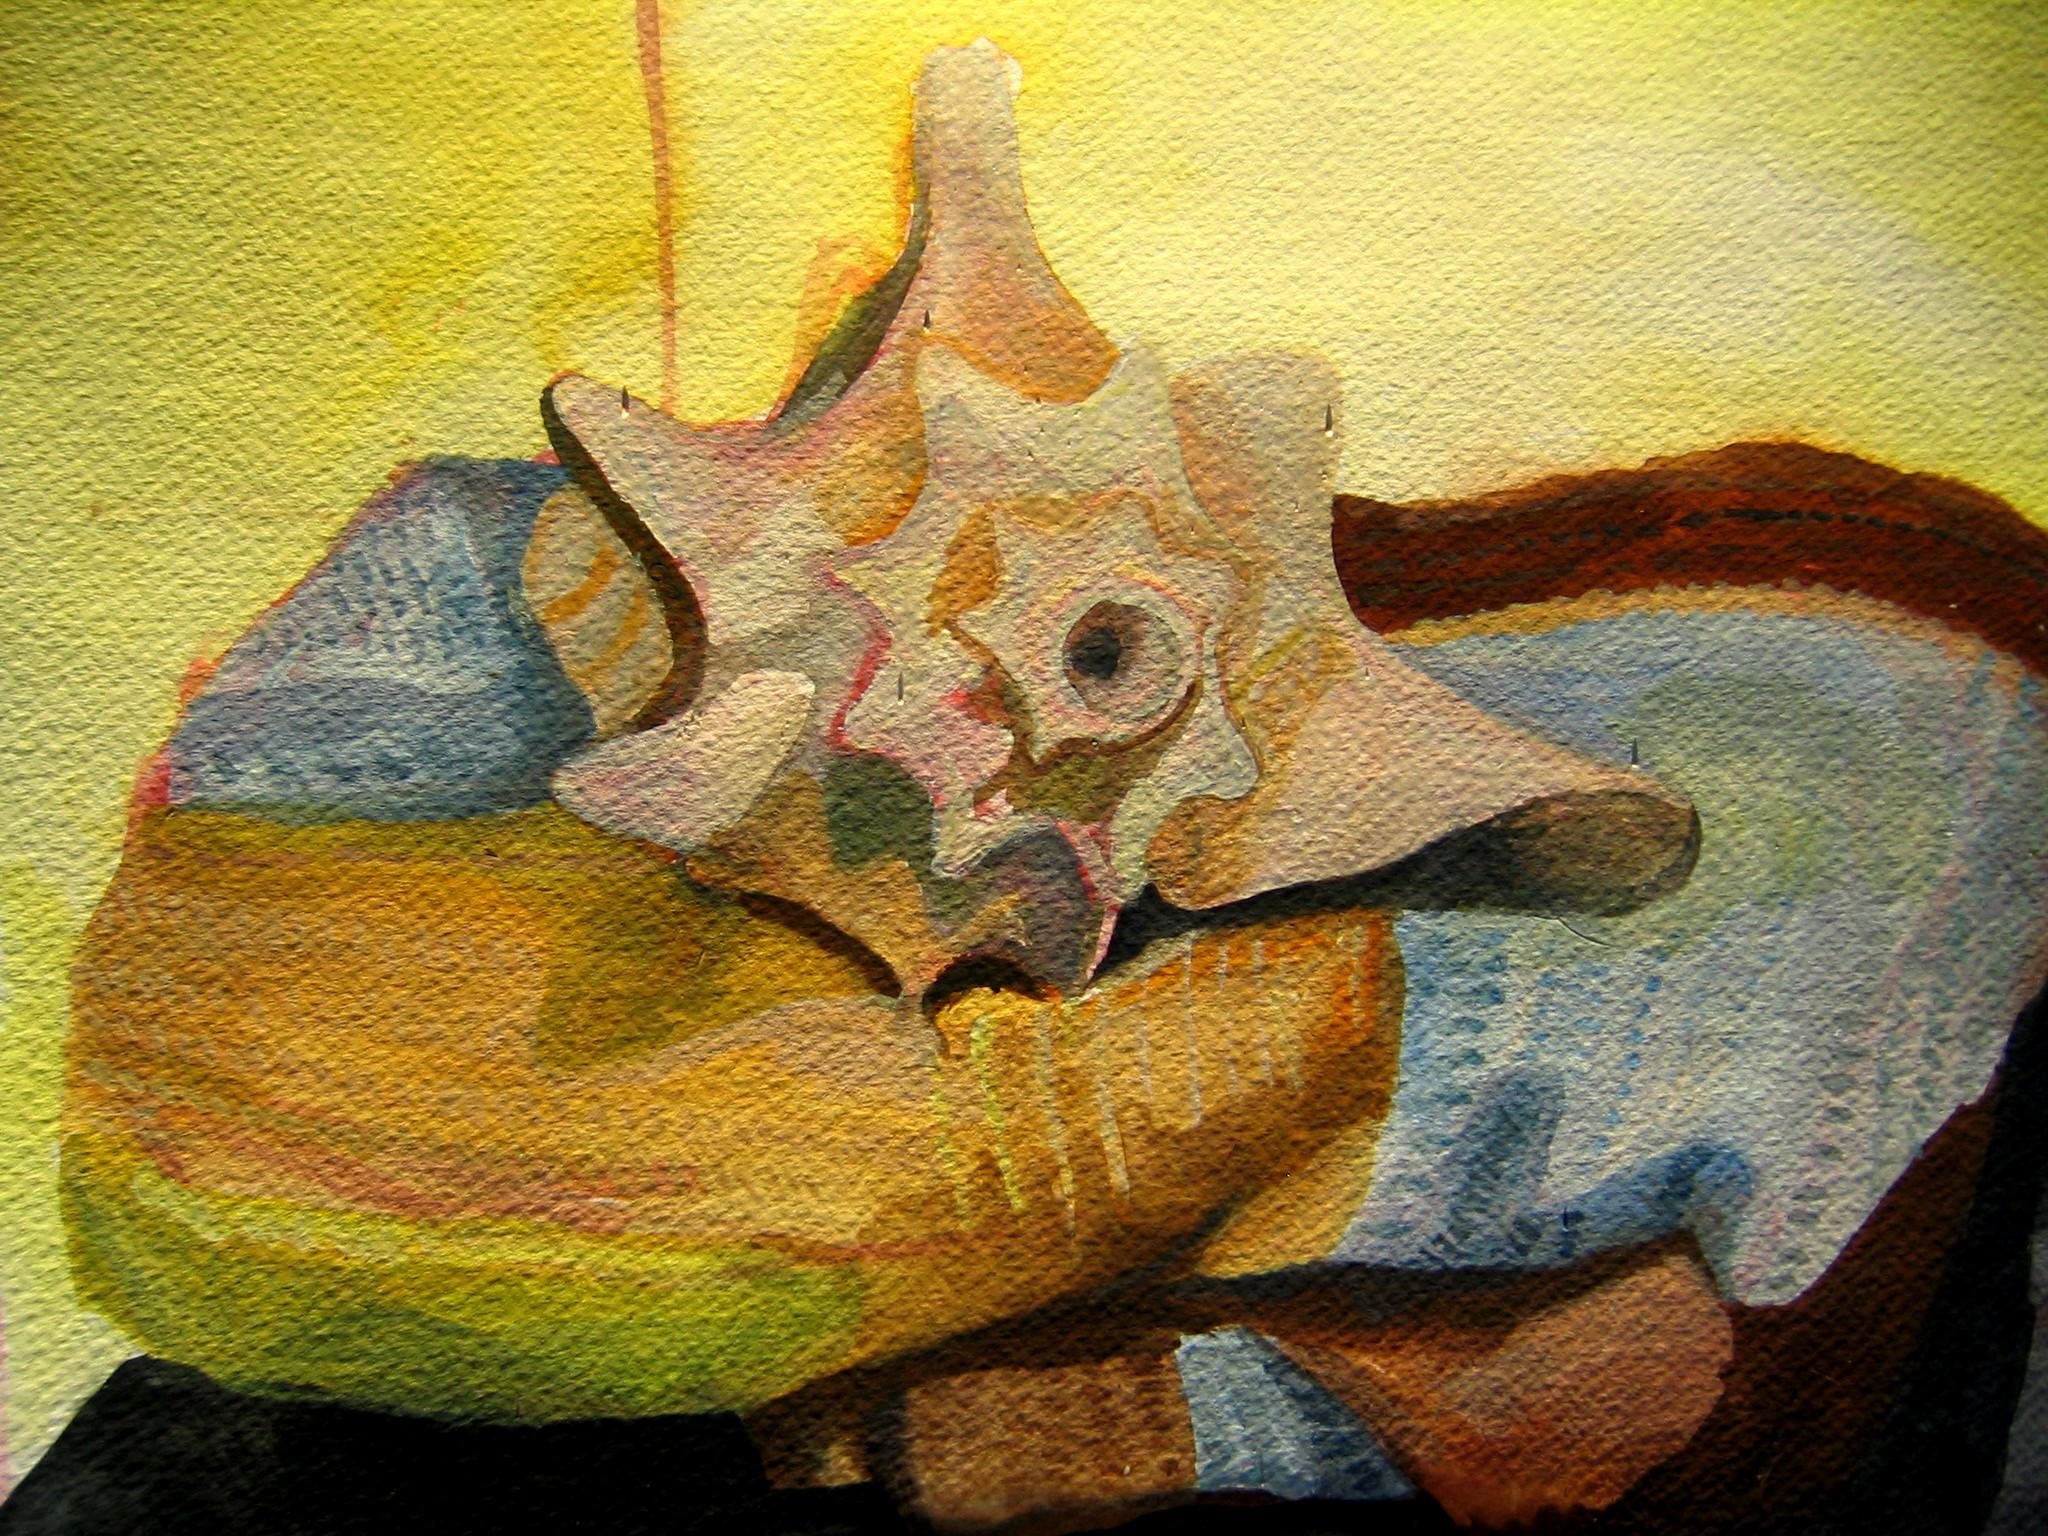 shell_and_blanket.JPG